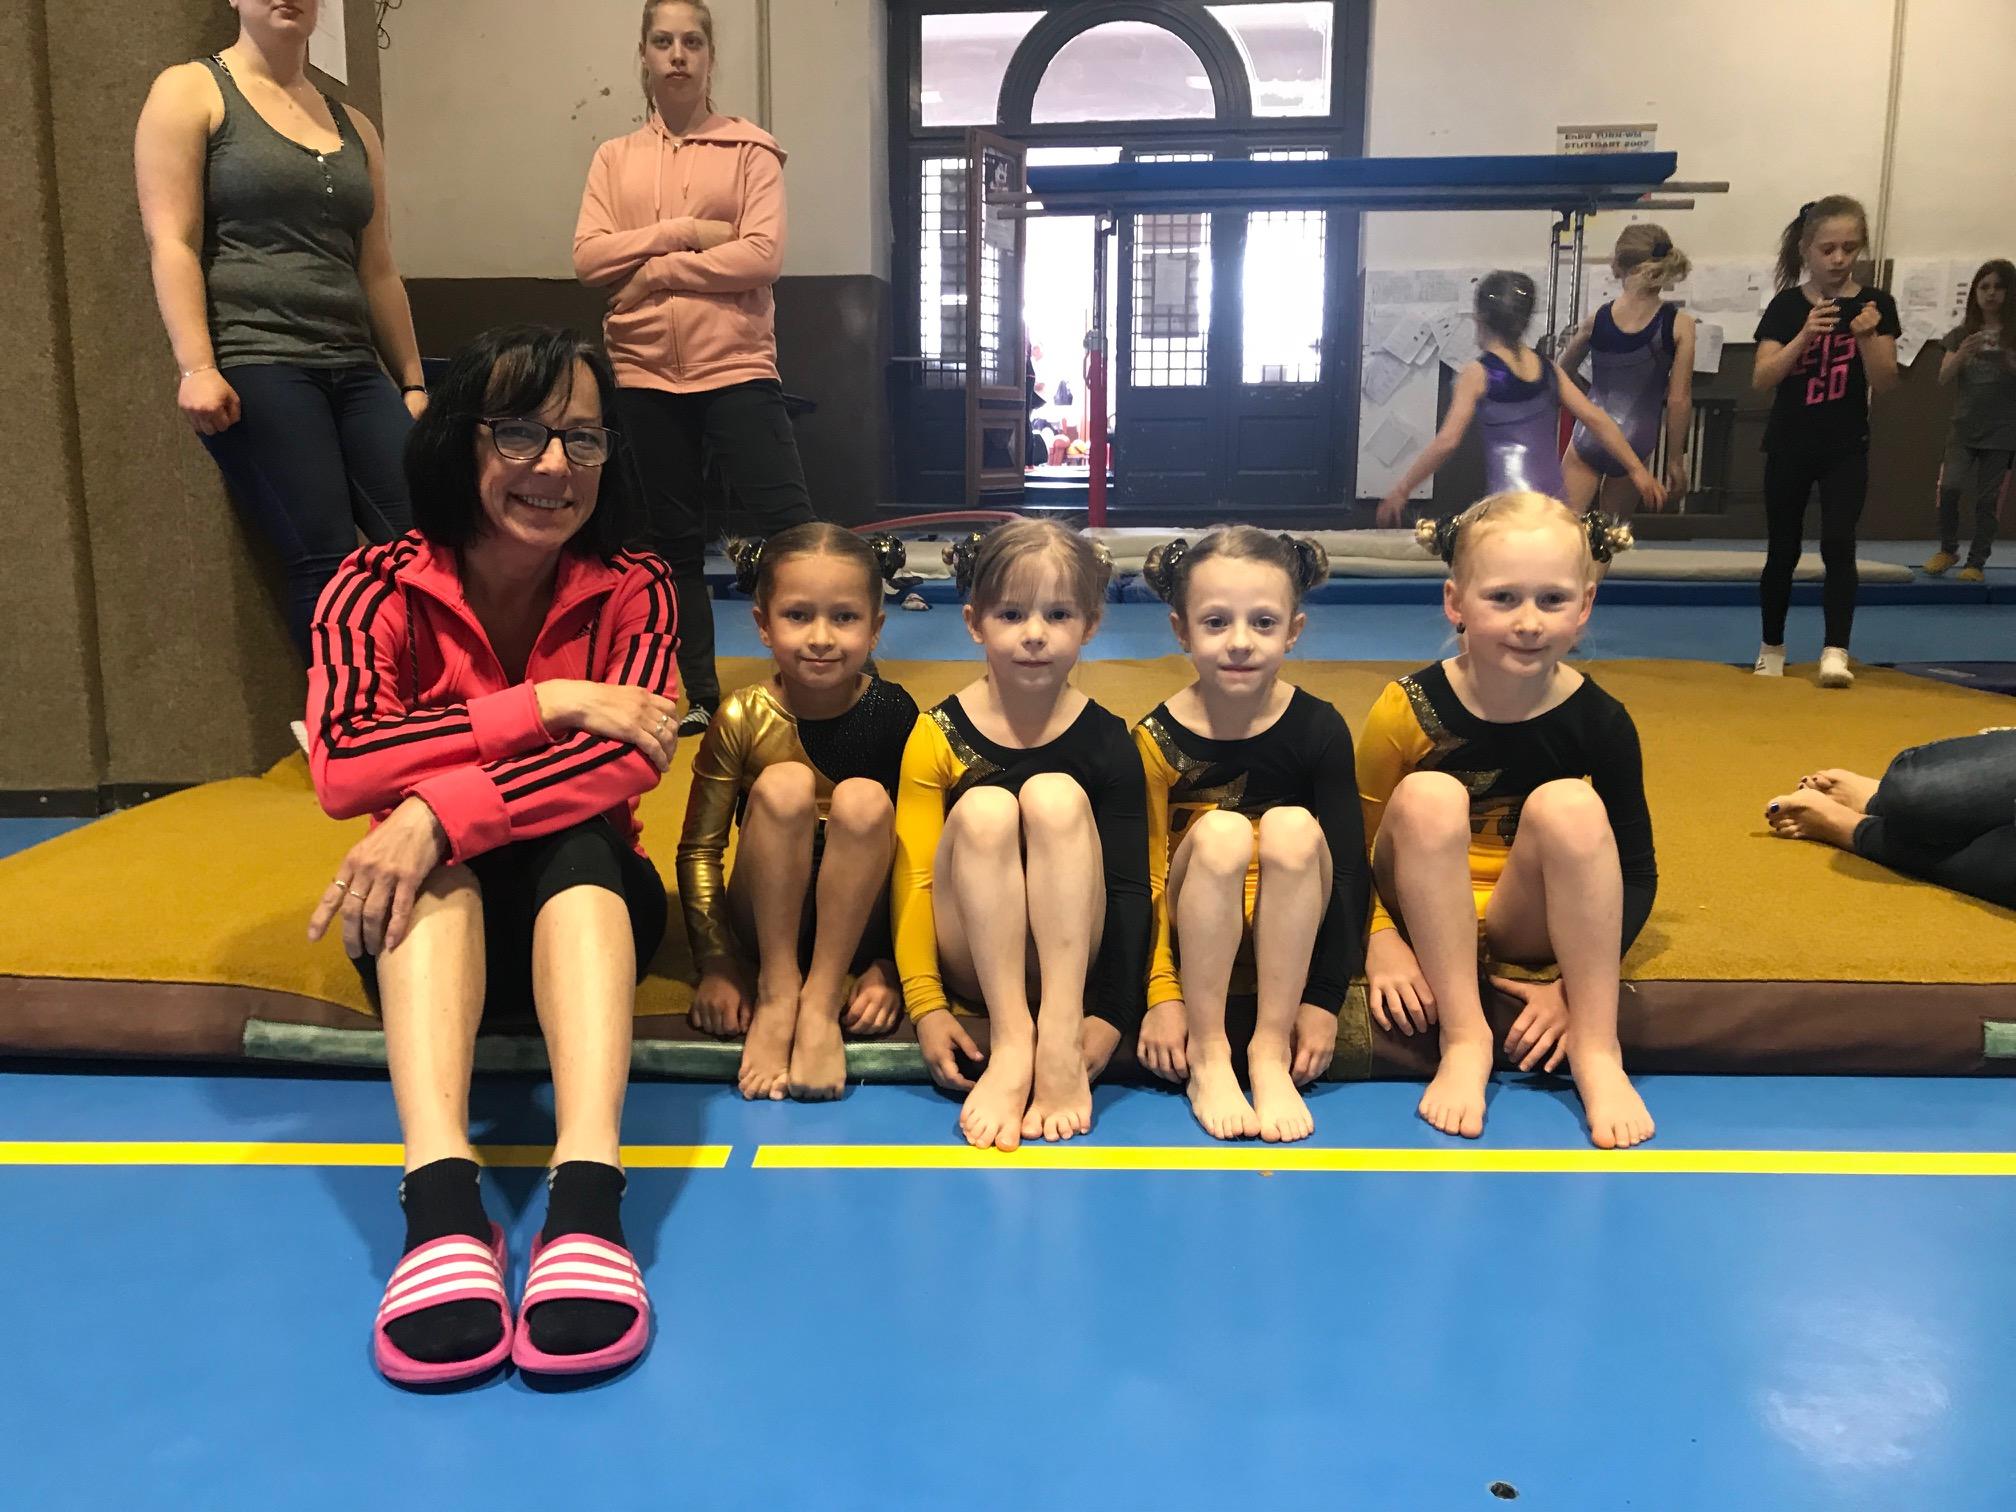 Klub Sportovni Gymnastiky Litvinov 2018